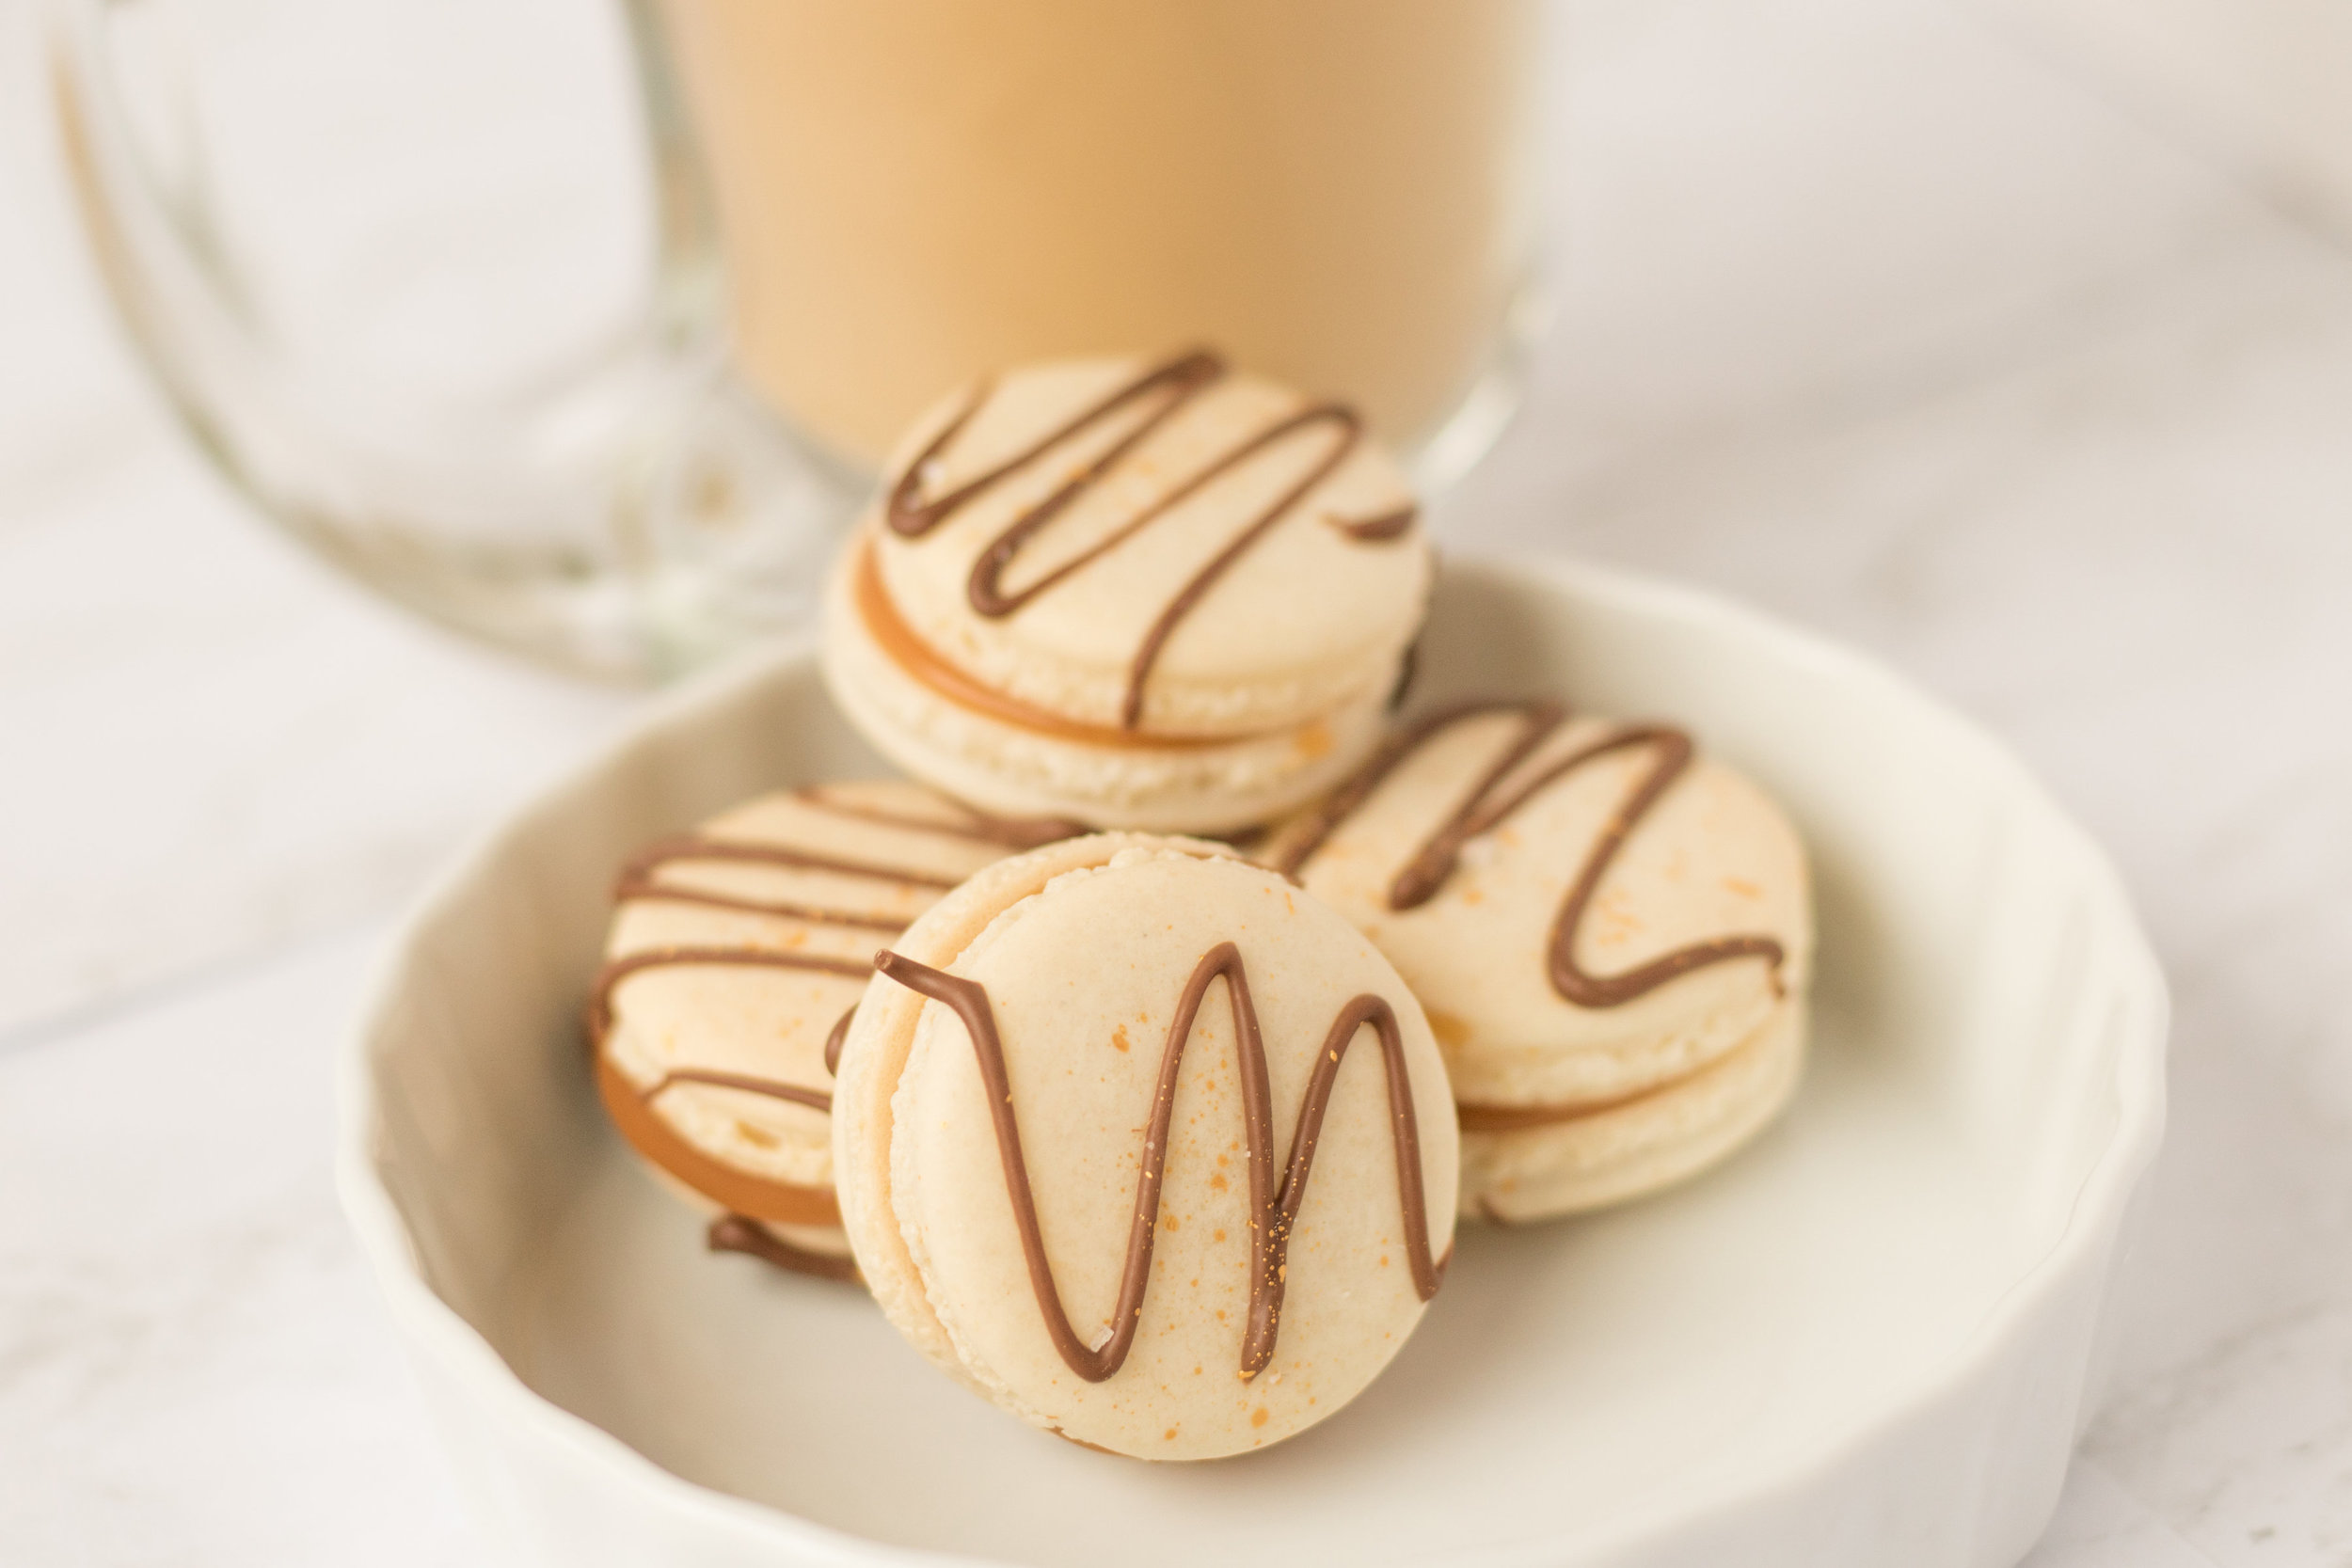 Salted Caramel Macarons - photo care of Gillian Nhem Photography